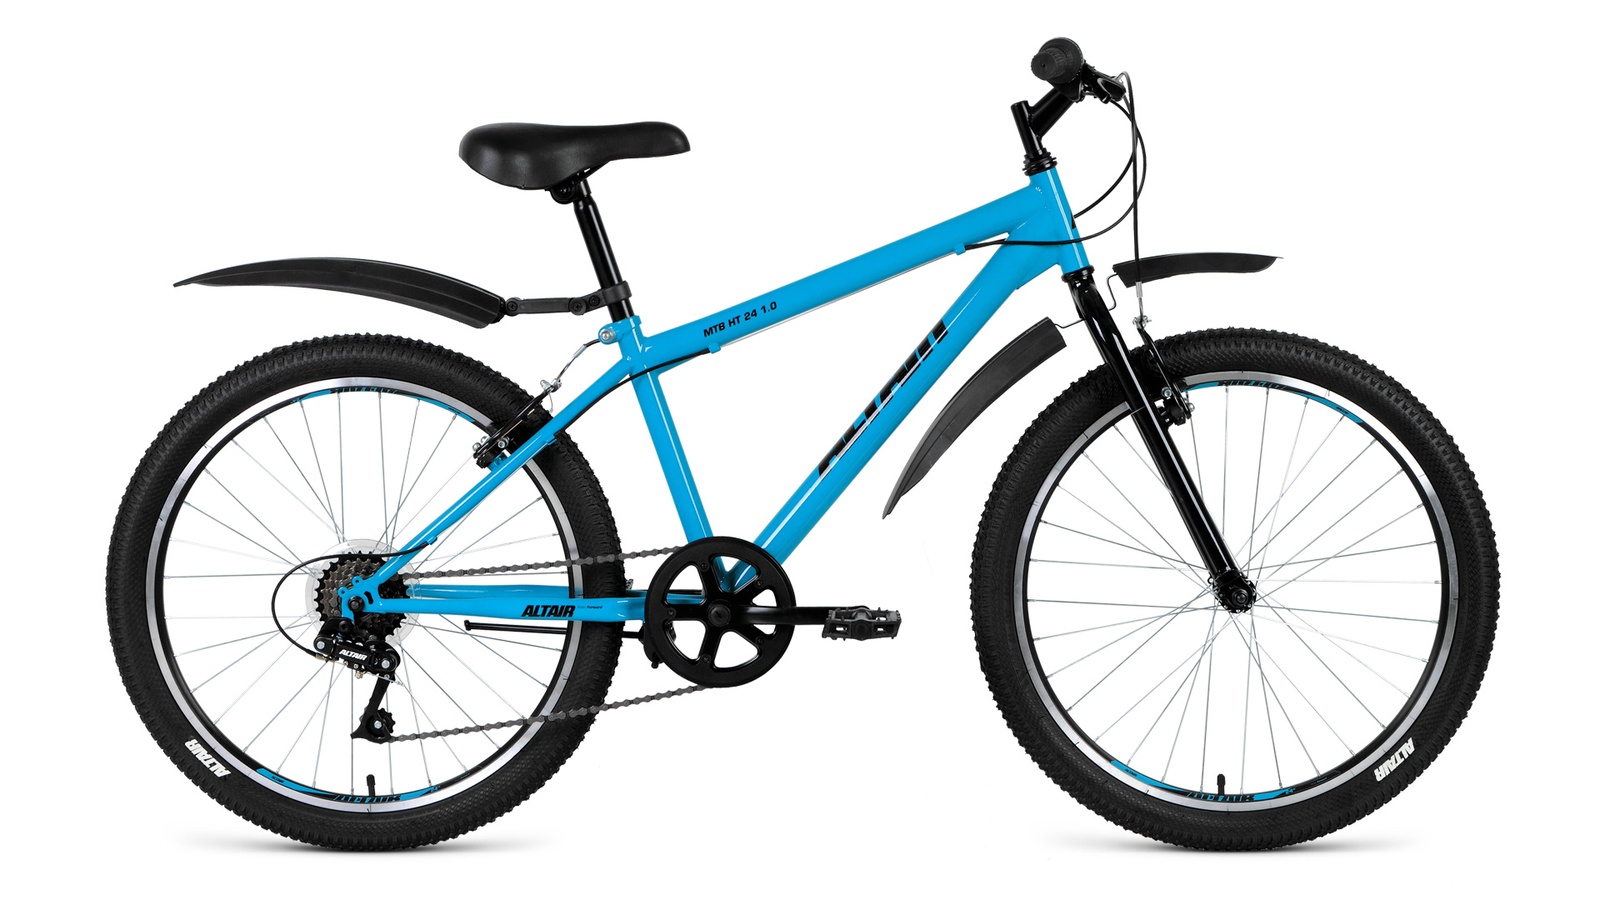 Велосипед Altair MTB HT 24 1.0 2019, бирюзовый altair mtb ht 26 1 0 lady 15 2017 blue